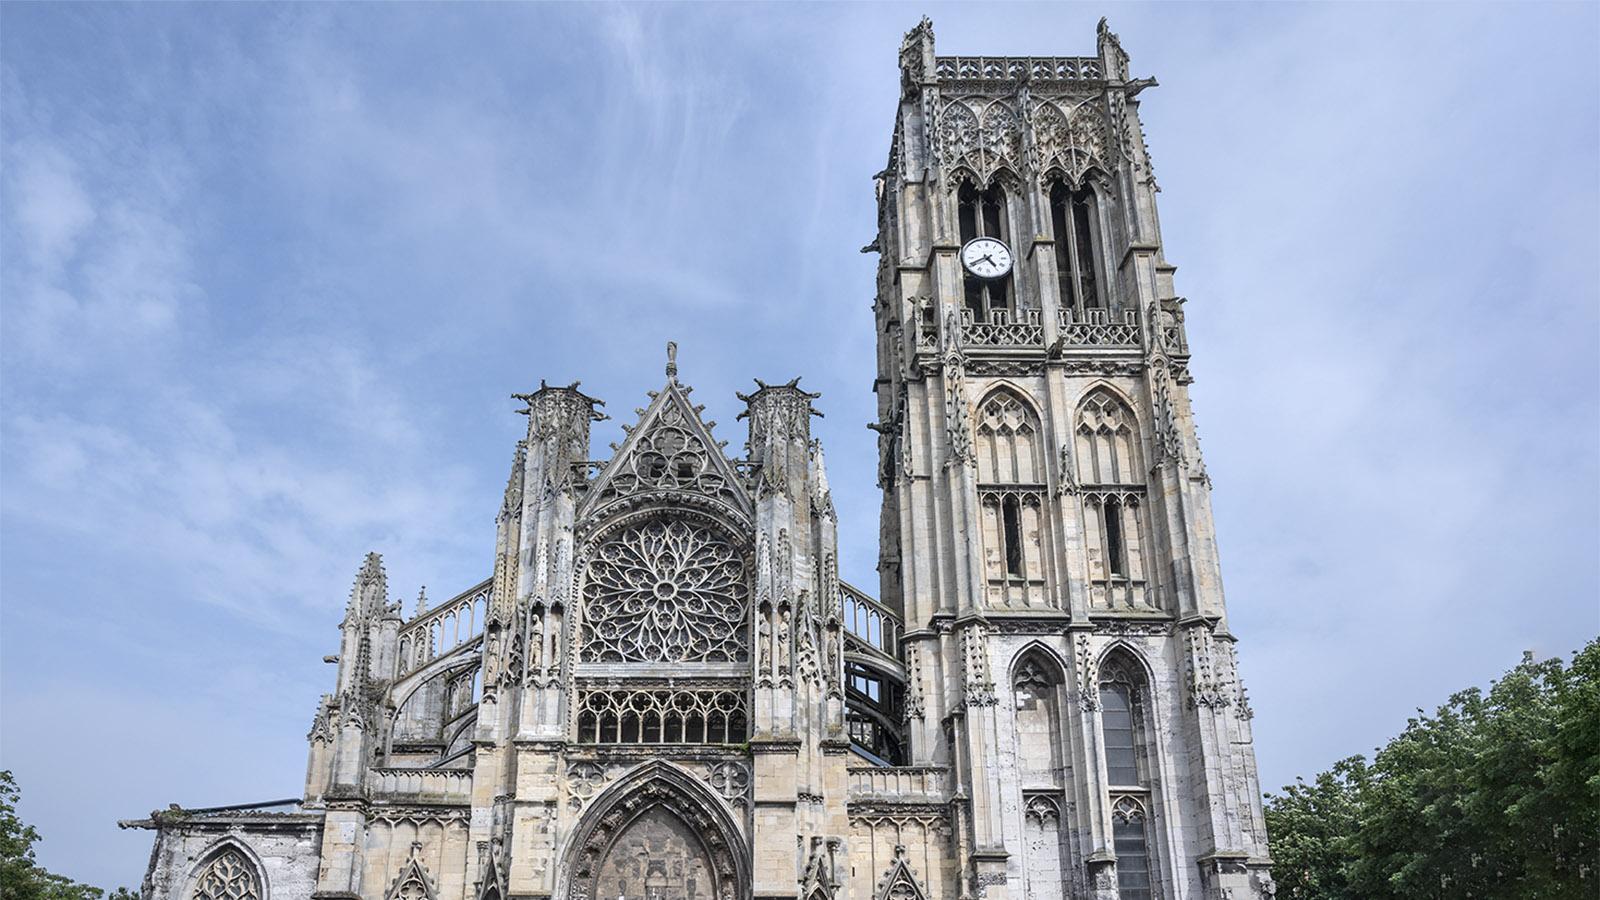 Die Église Saint-Jacques von Dieppe. Foto: Hilke Maunder